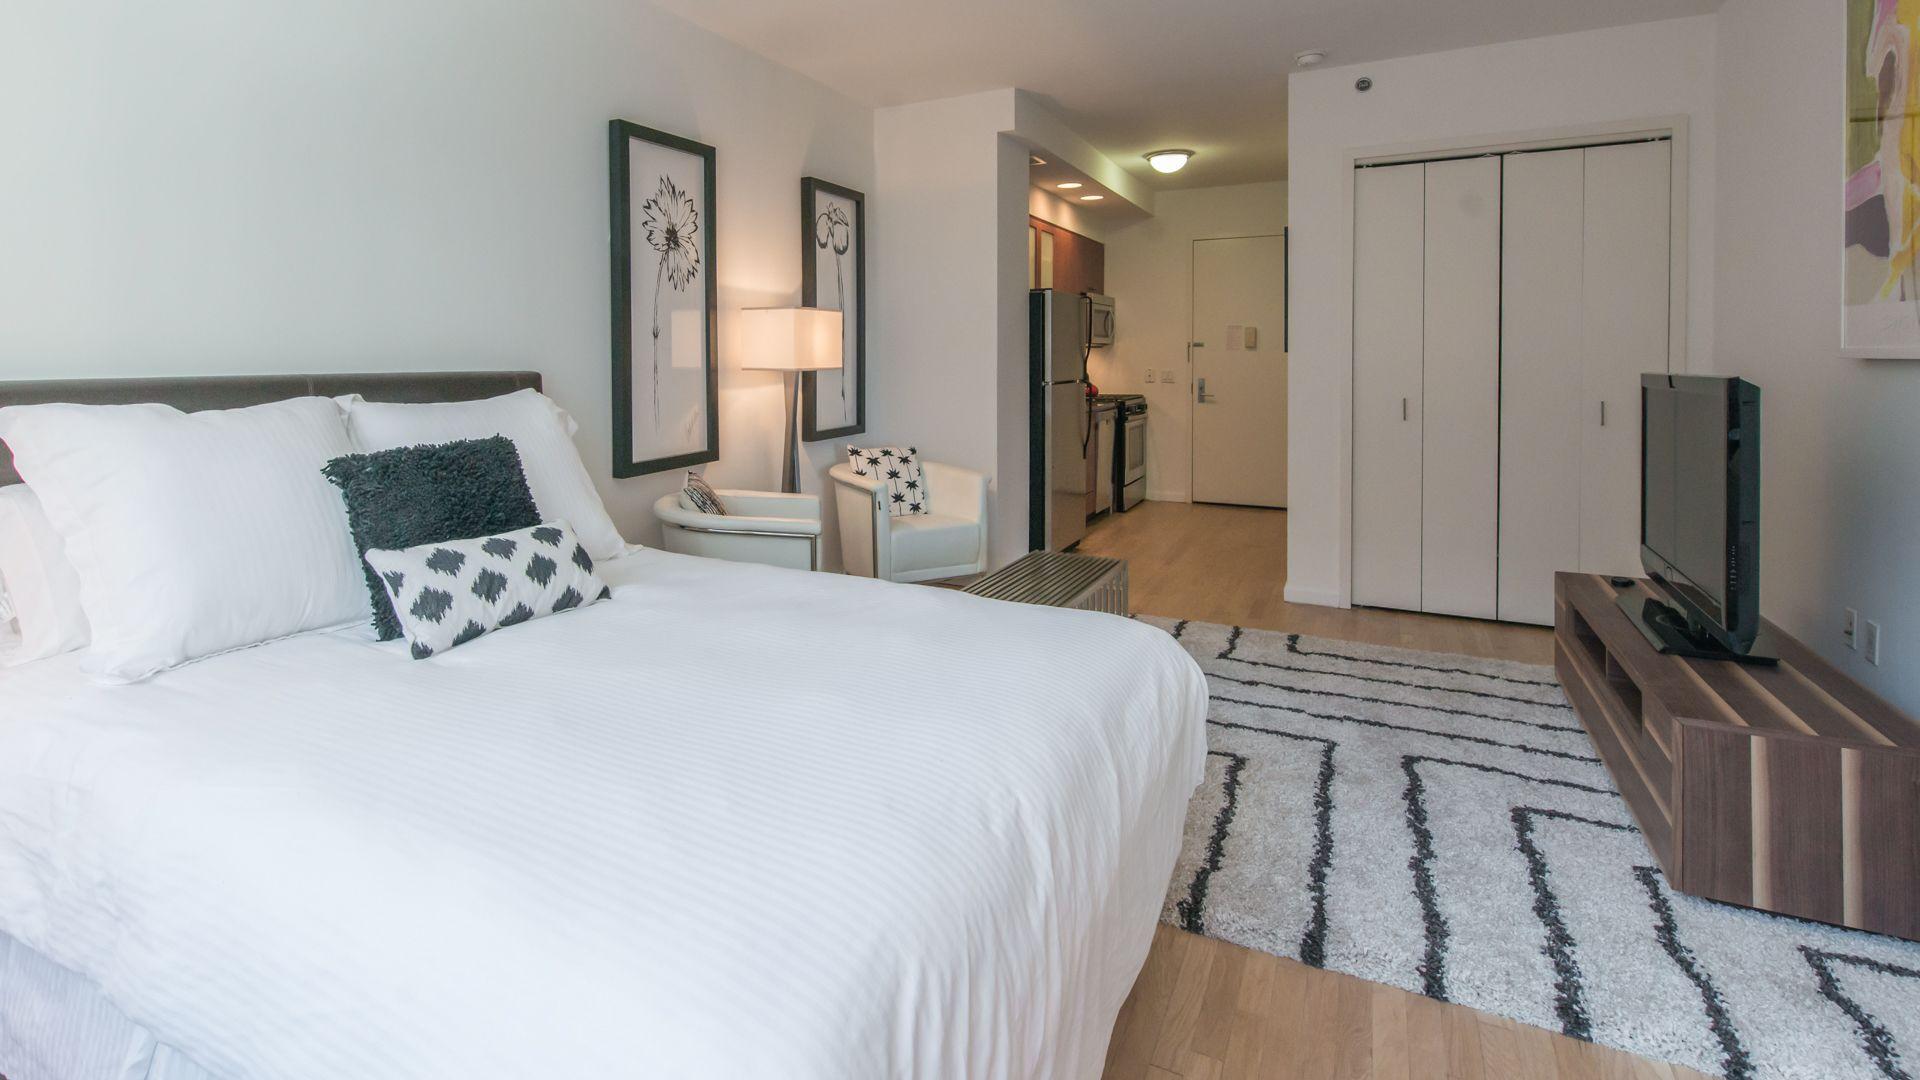 1 Bedroom Apartments 600 Honduraeraria Info